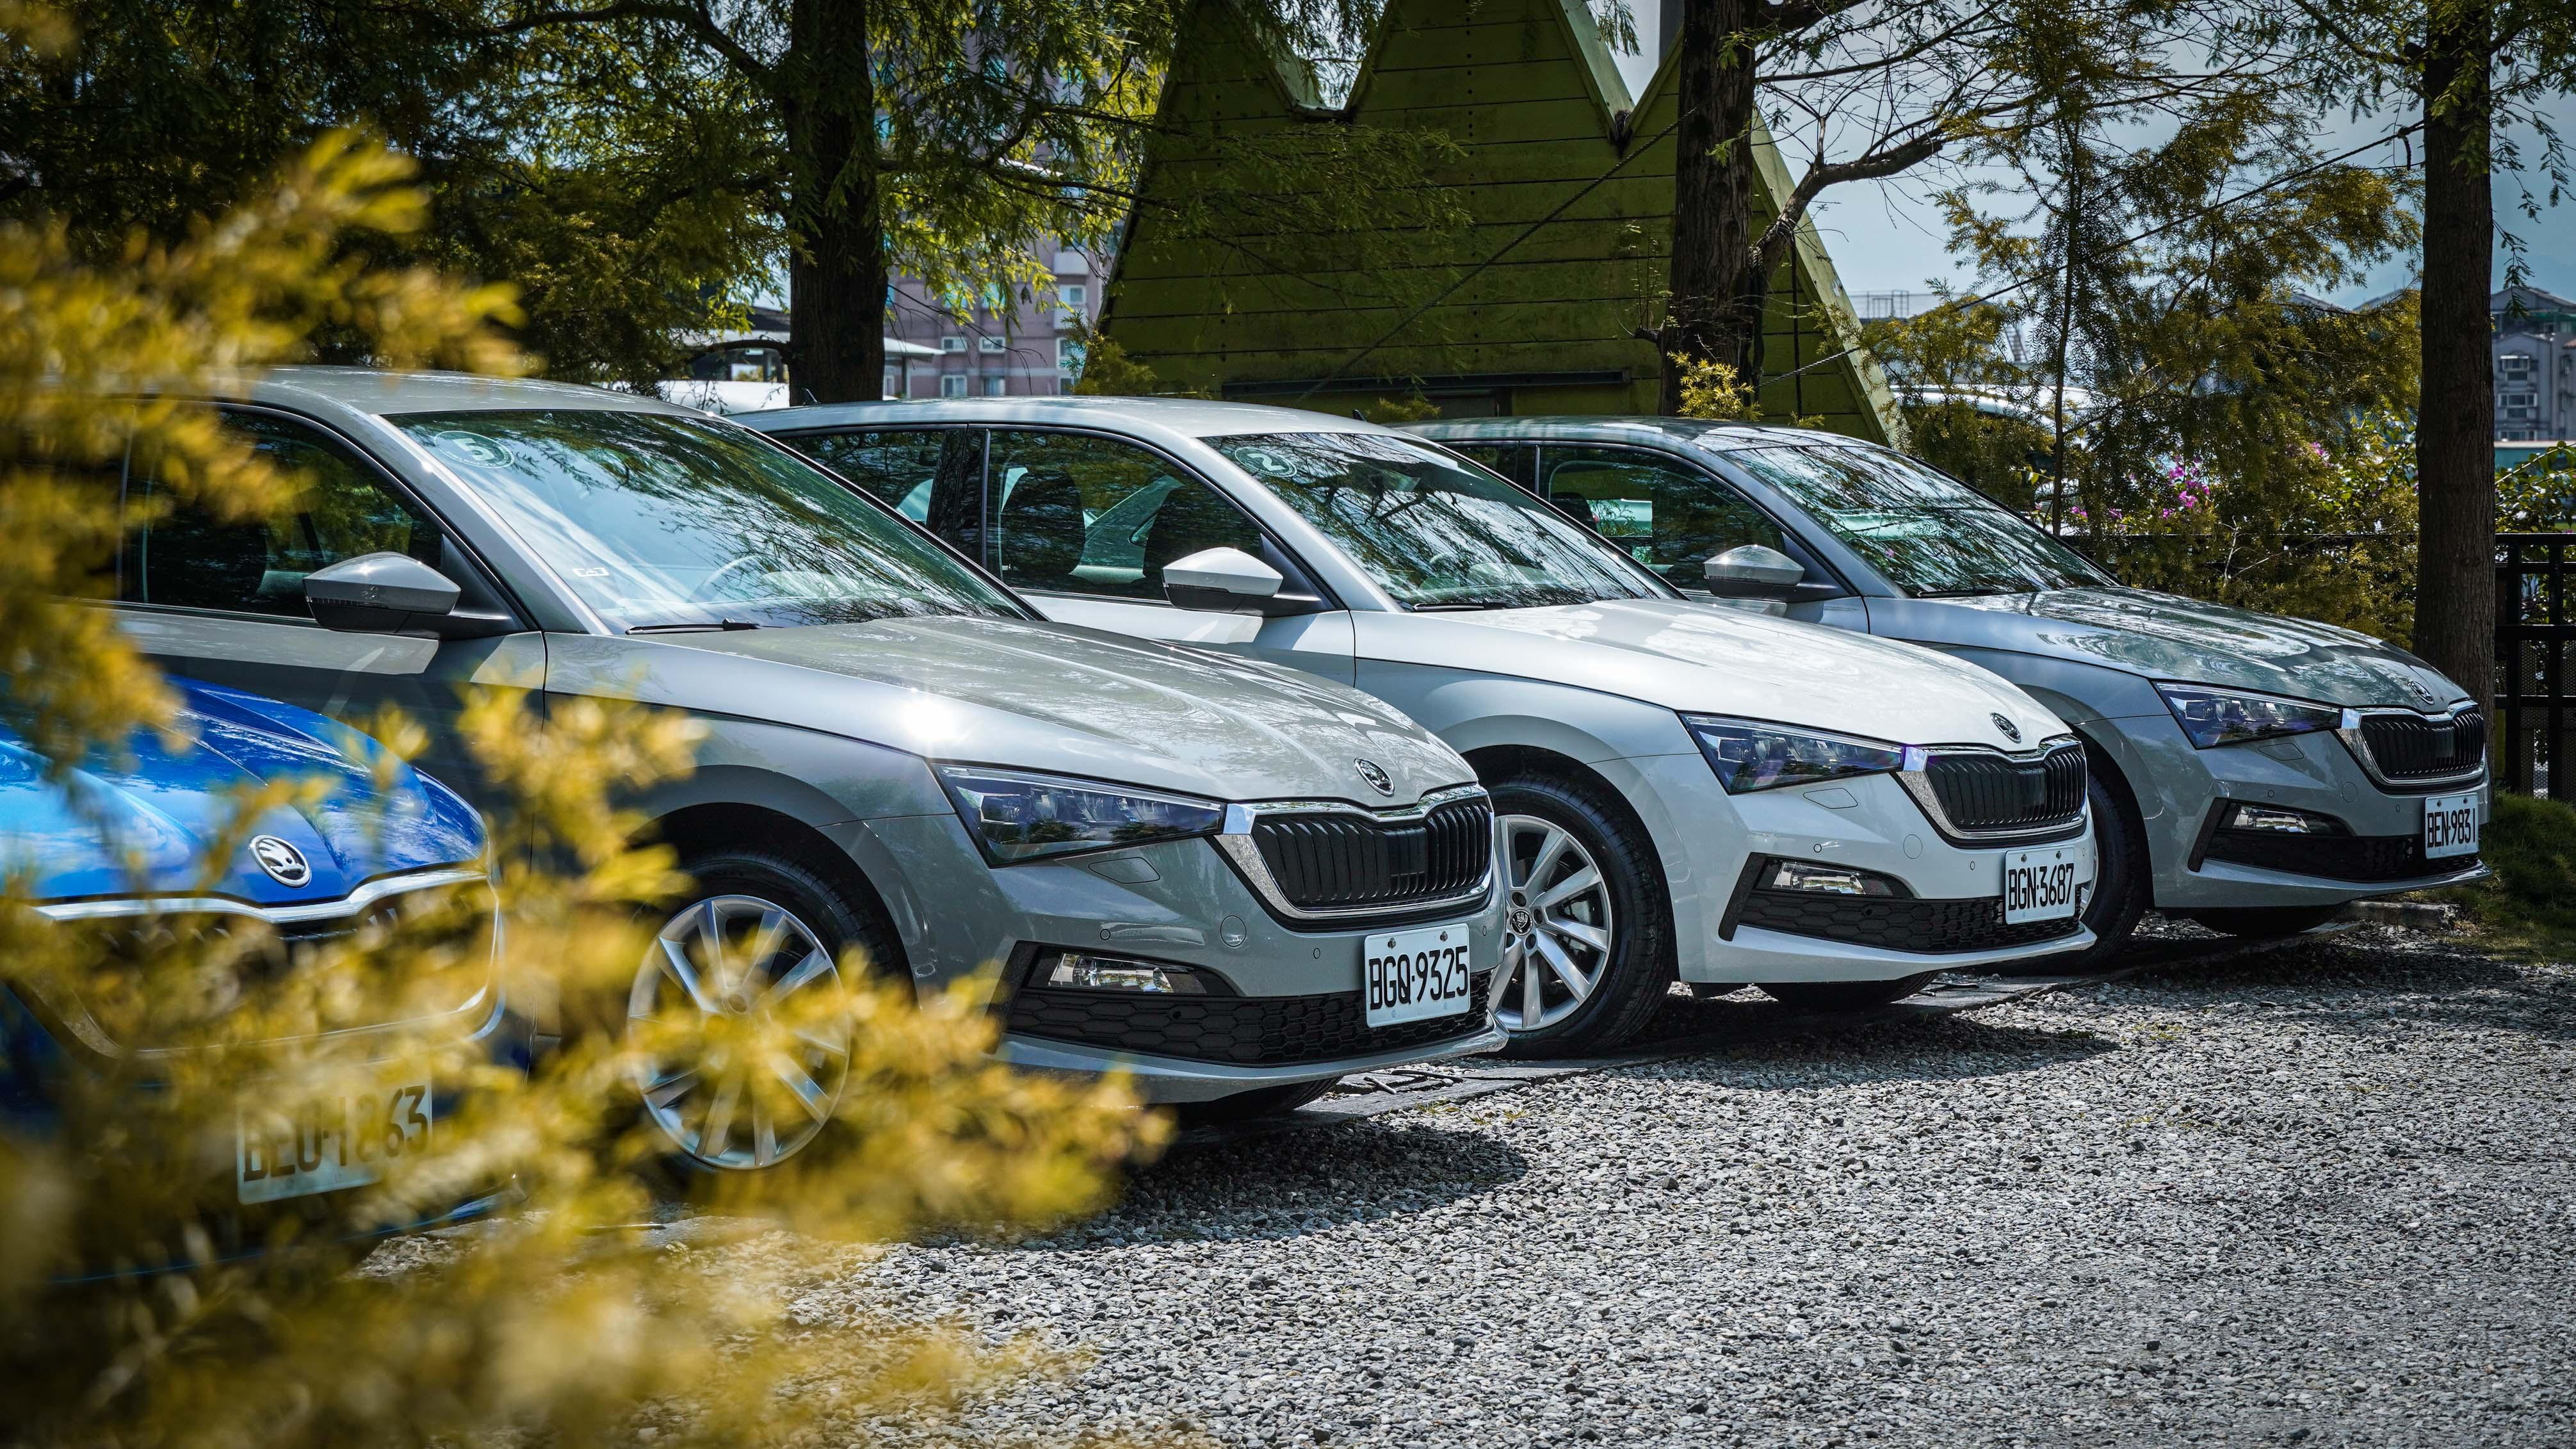 Škoda Scala 以動能版、豪華動能版、菁英版、豪華菁英版四車型販售,分別為 89.9、95.9、98.9、103.9 萬元 。